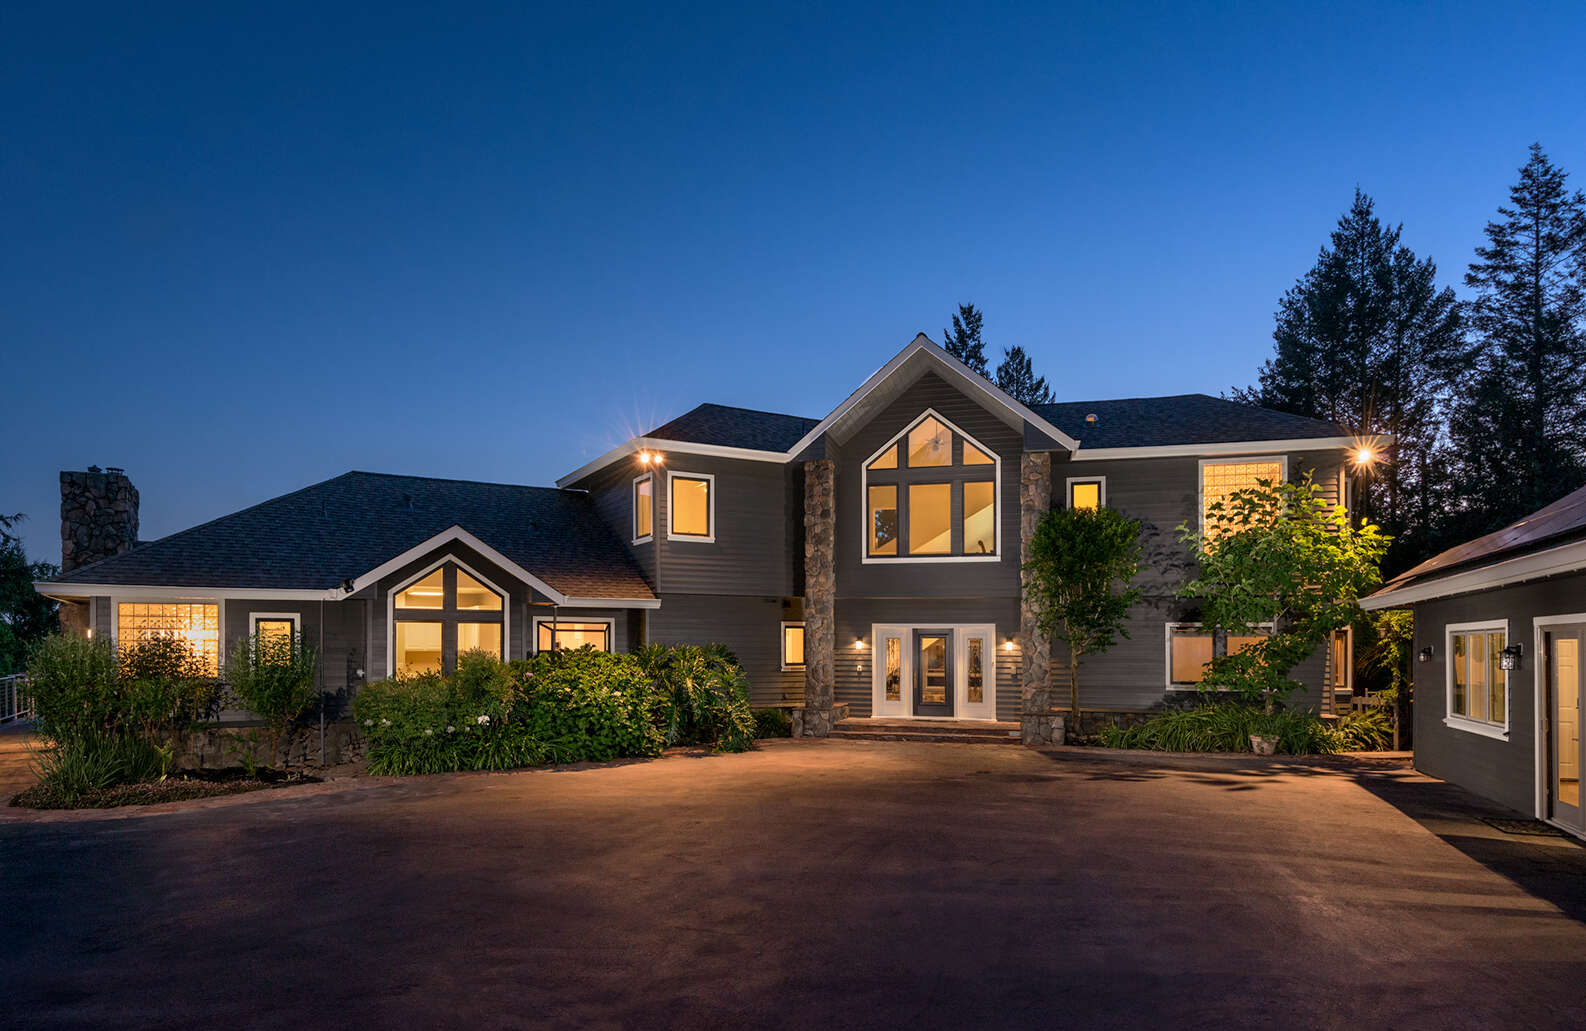 Single Family for Sale at 1799 Crystal Springs Ct Santa Rosa, California 95404 United States